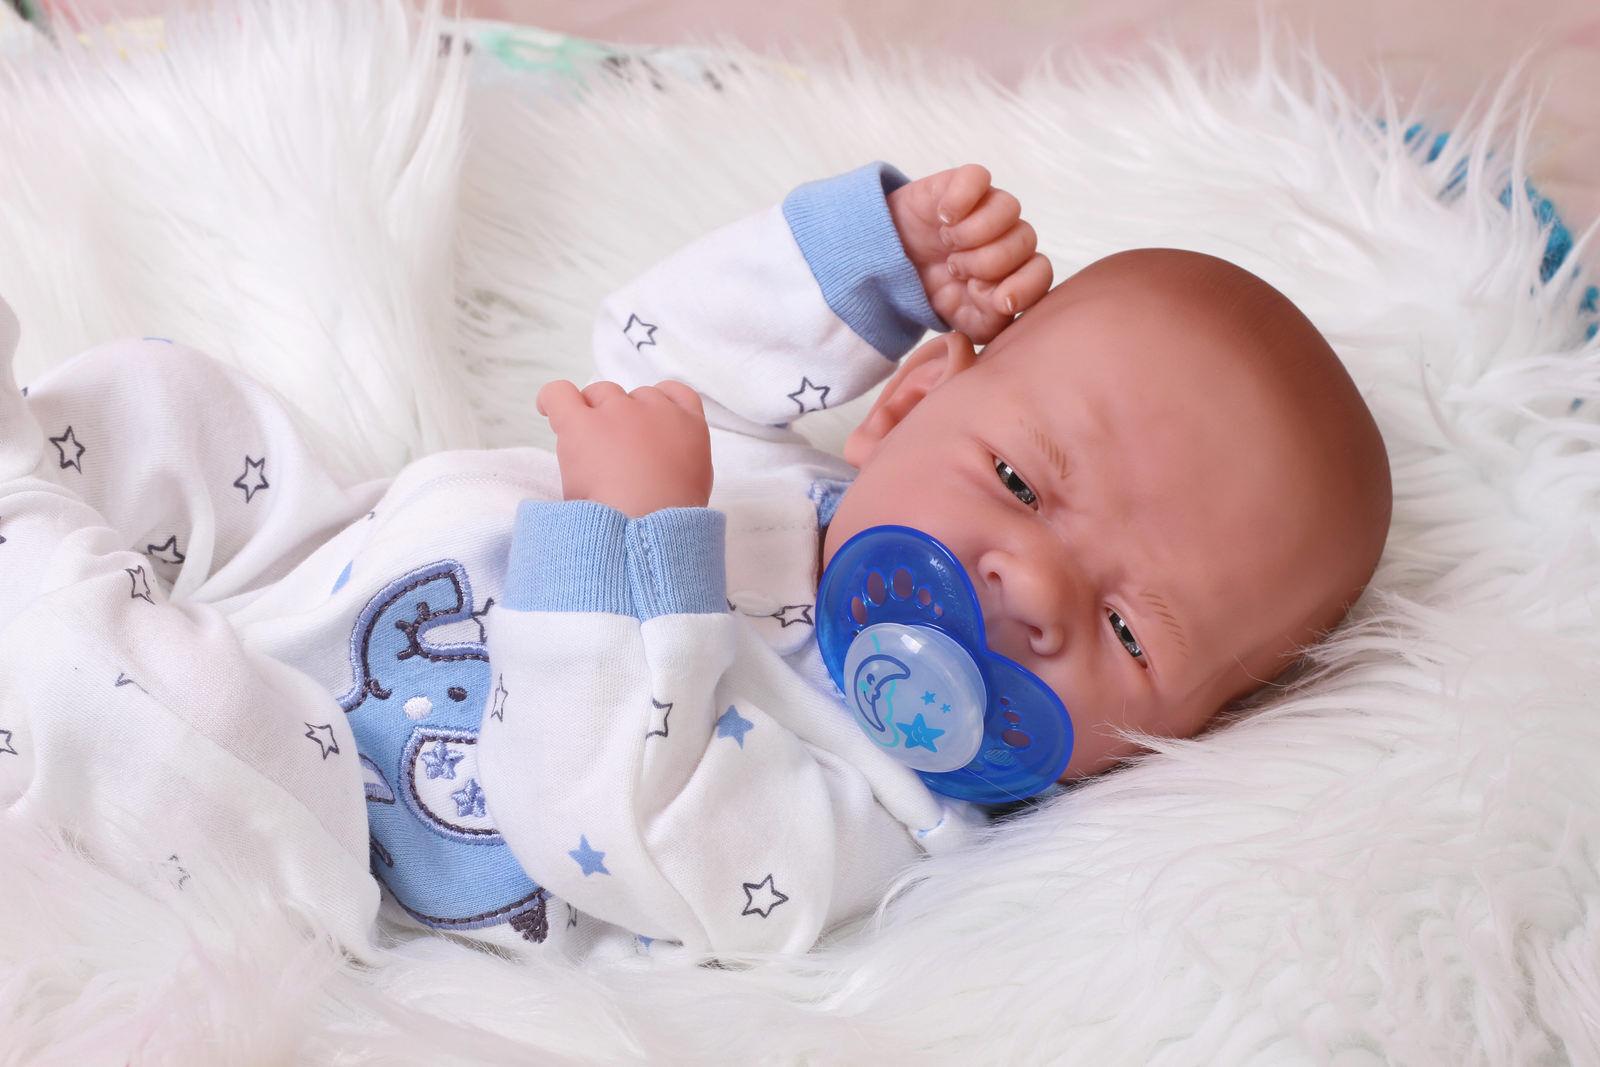 Bebé Real Niño Reborn Muñeca Preemie Juguete Newborn 15 Newborn Suave Vinilo